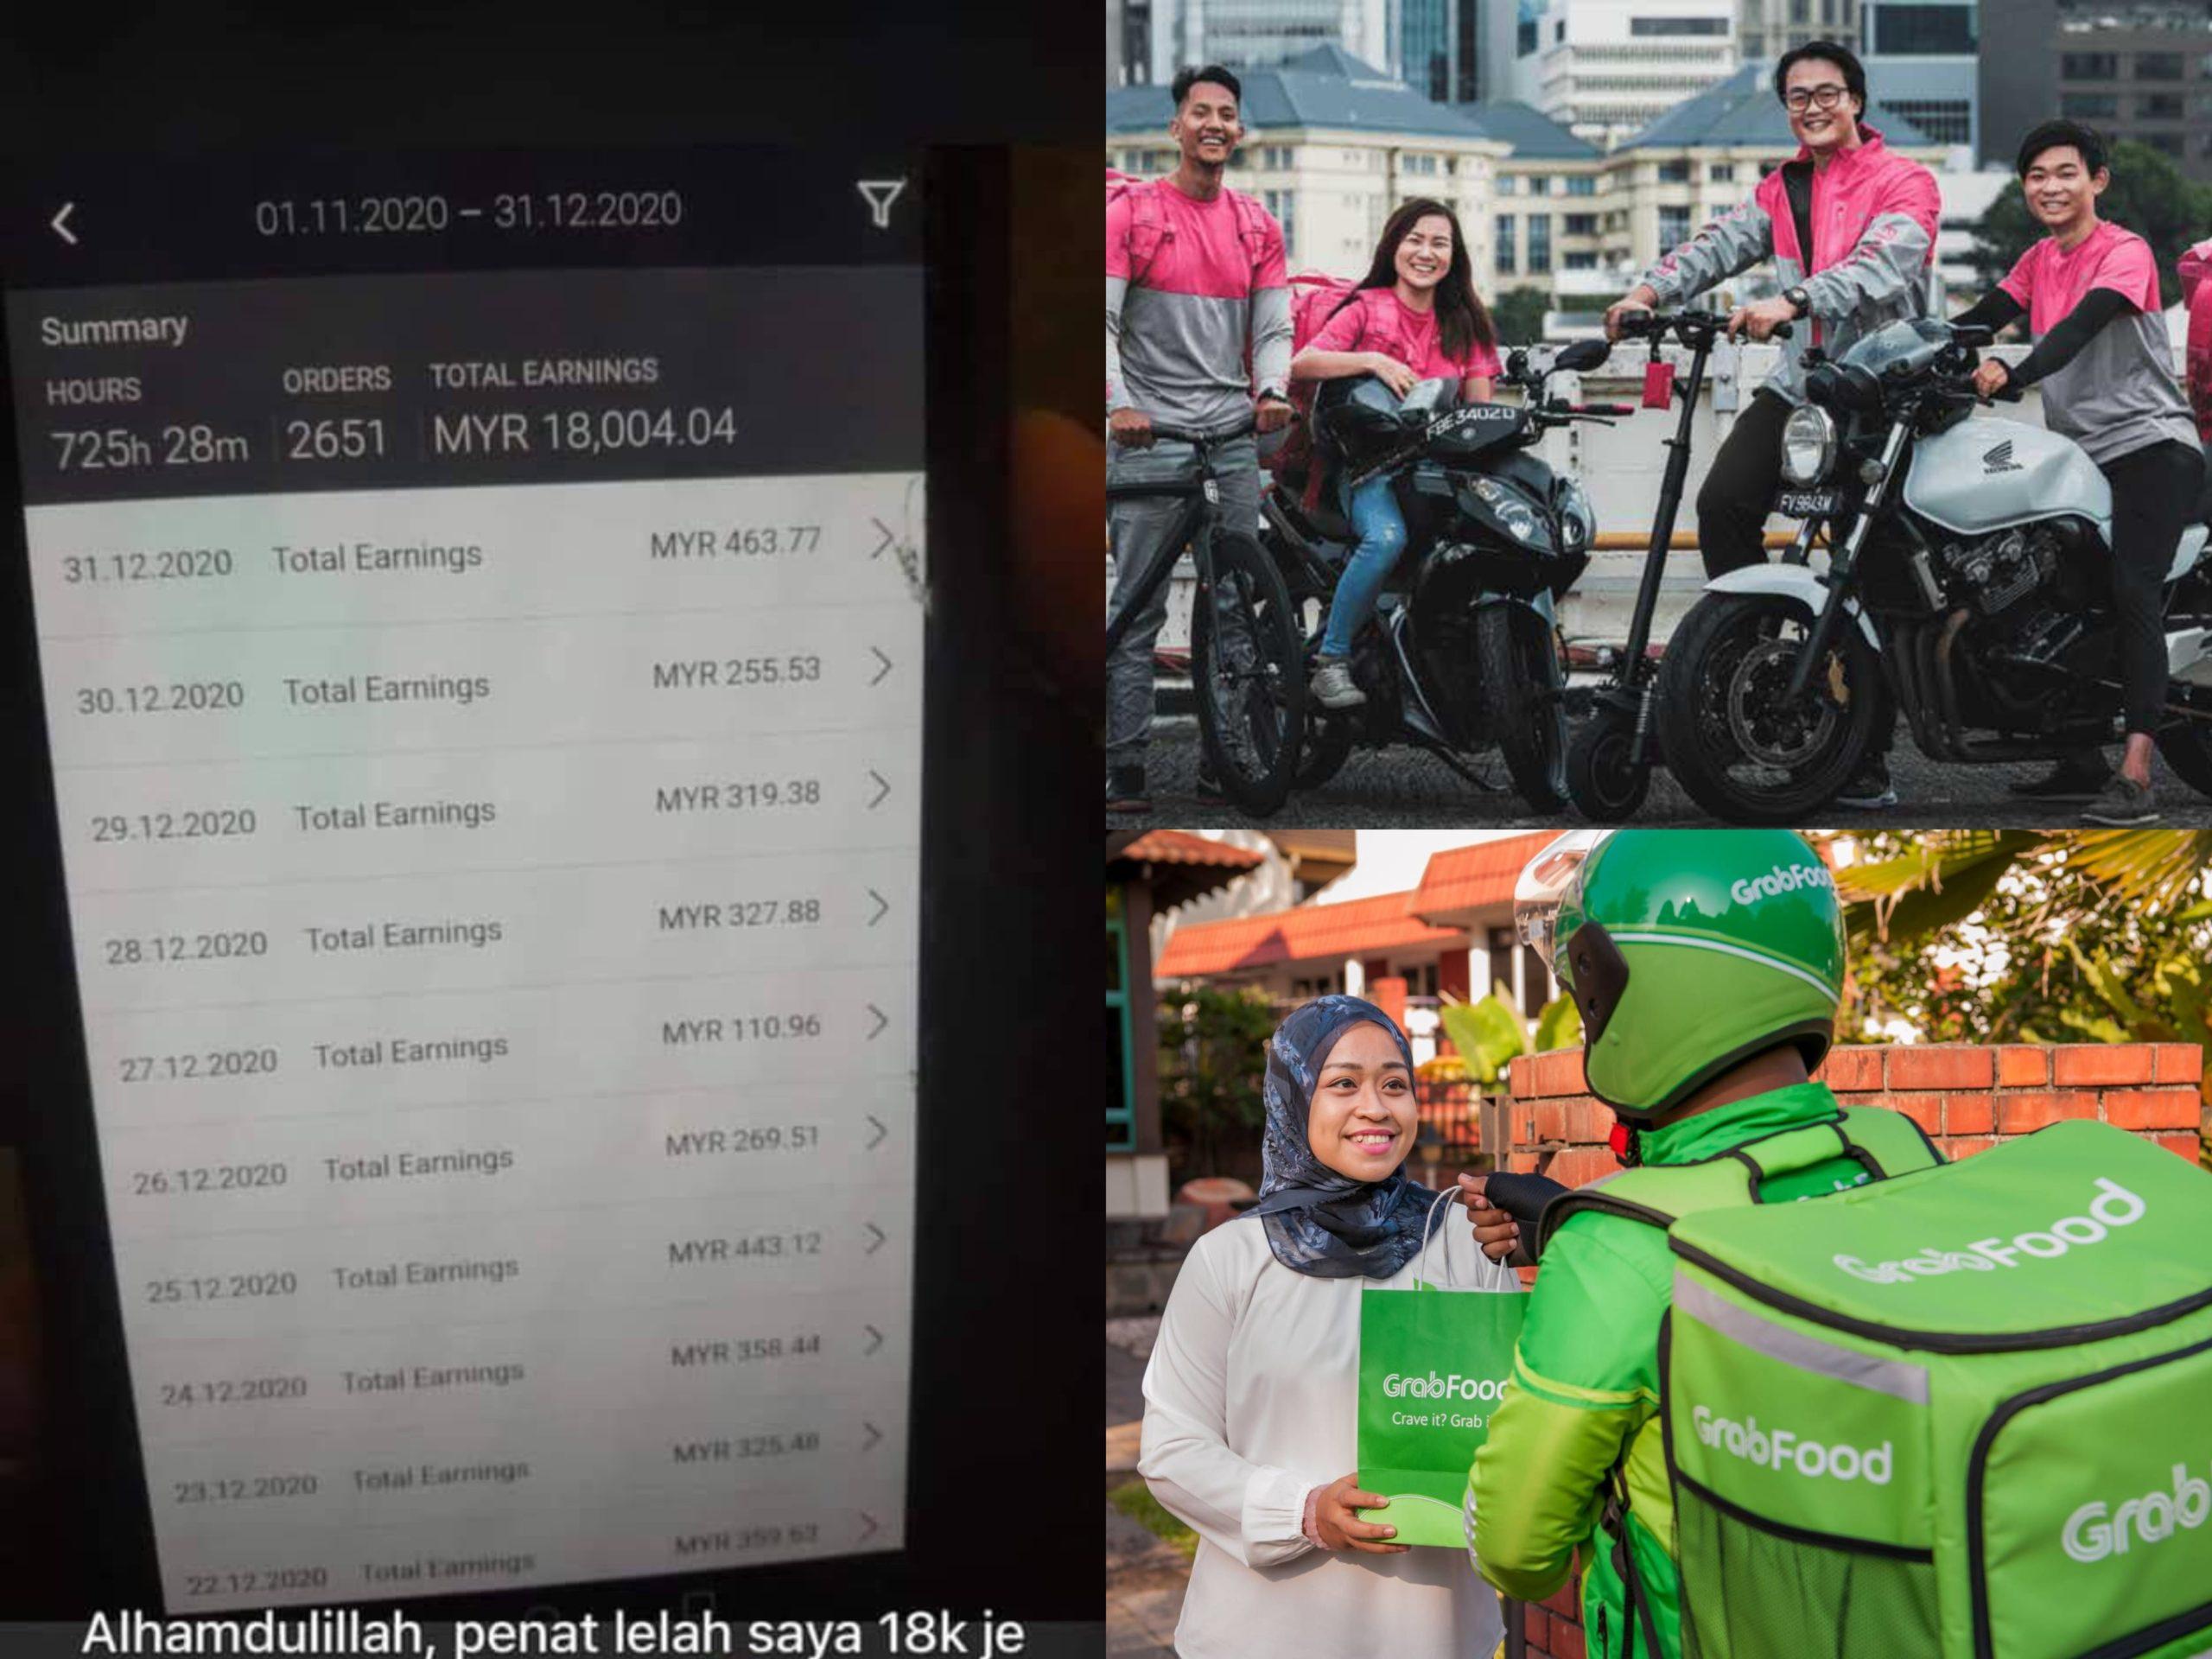 Gaji Rider Cecah RM18,000 Sebulan!